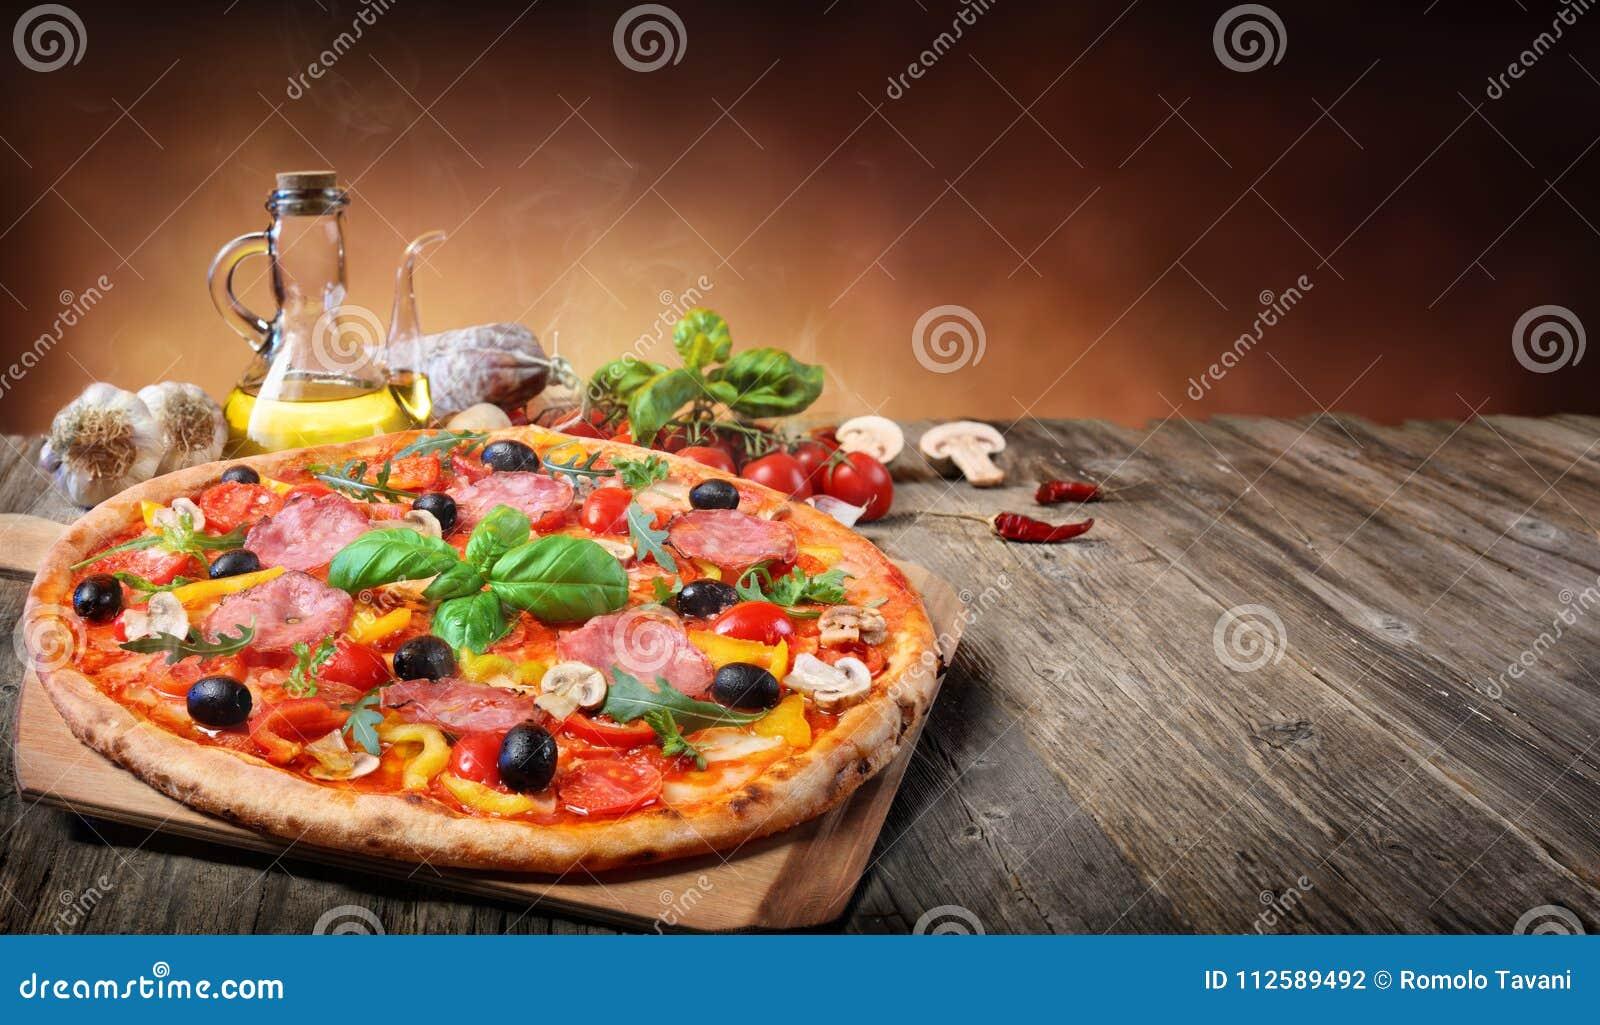 Pizza quente servida na tabela velha